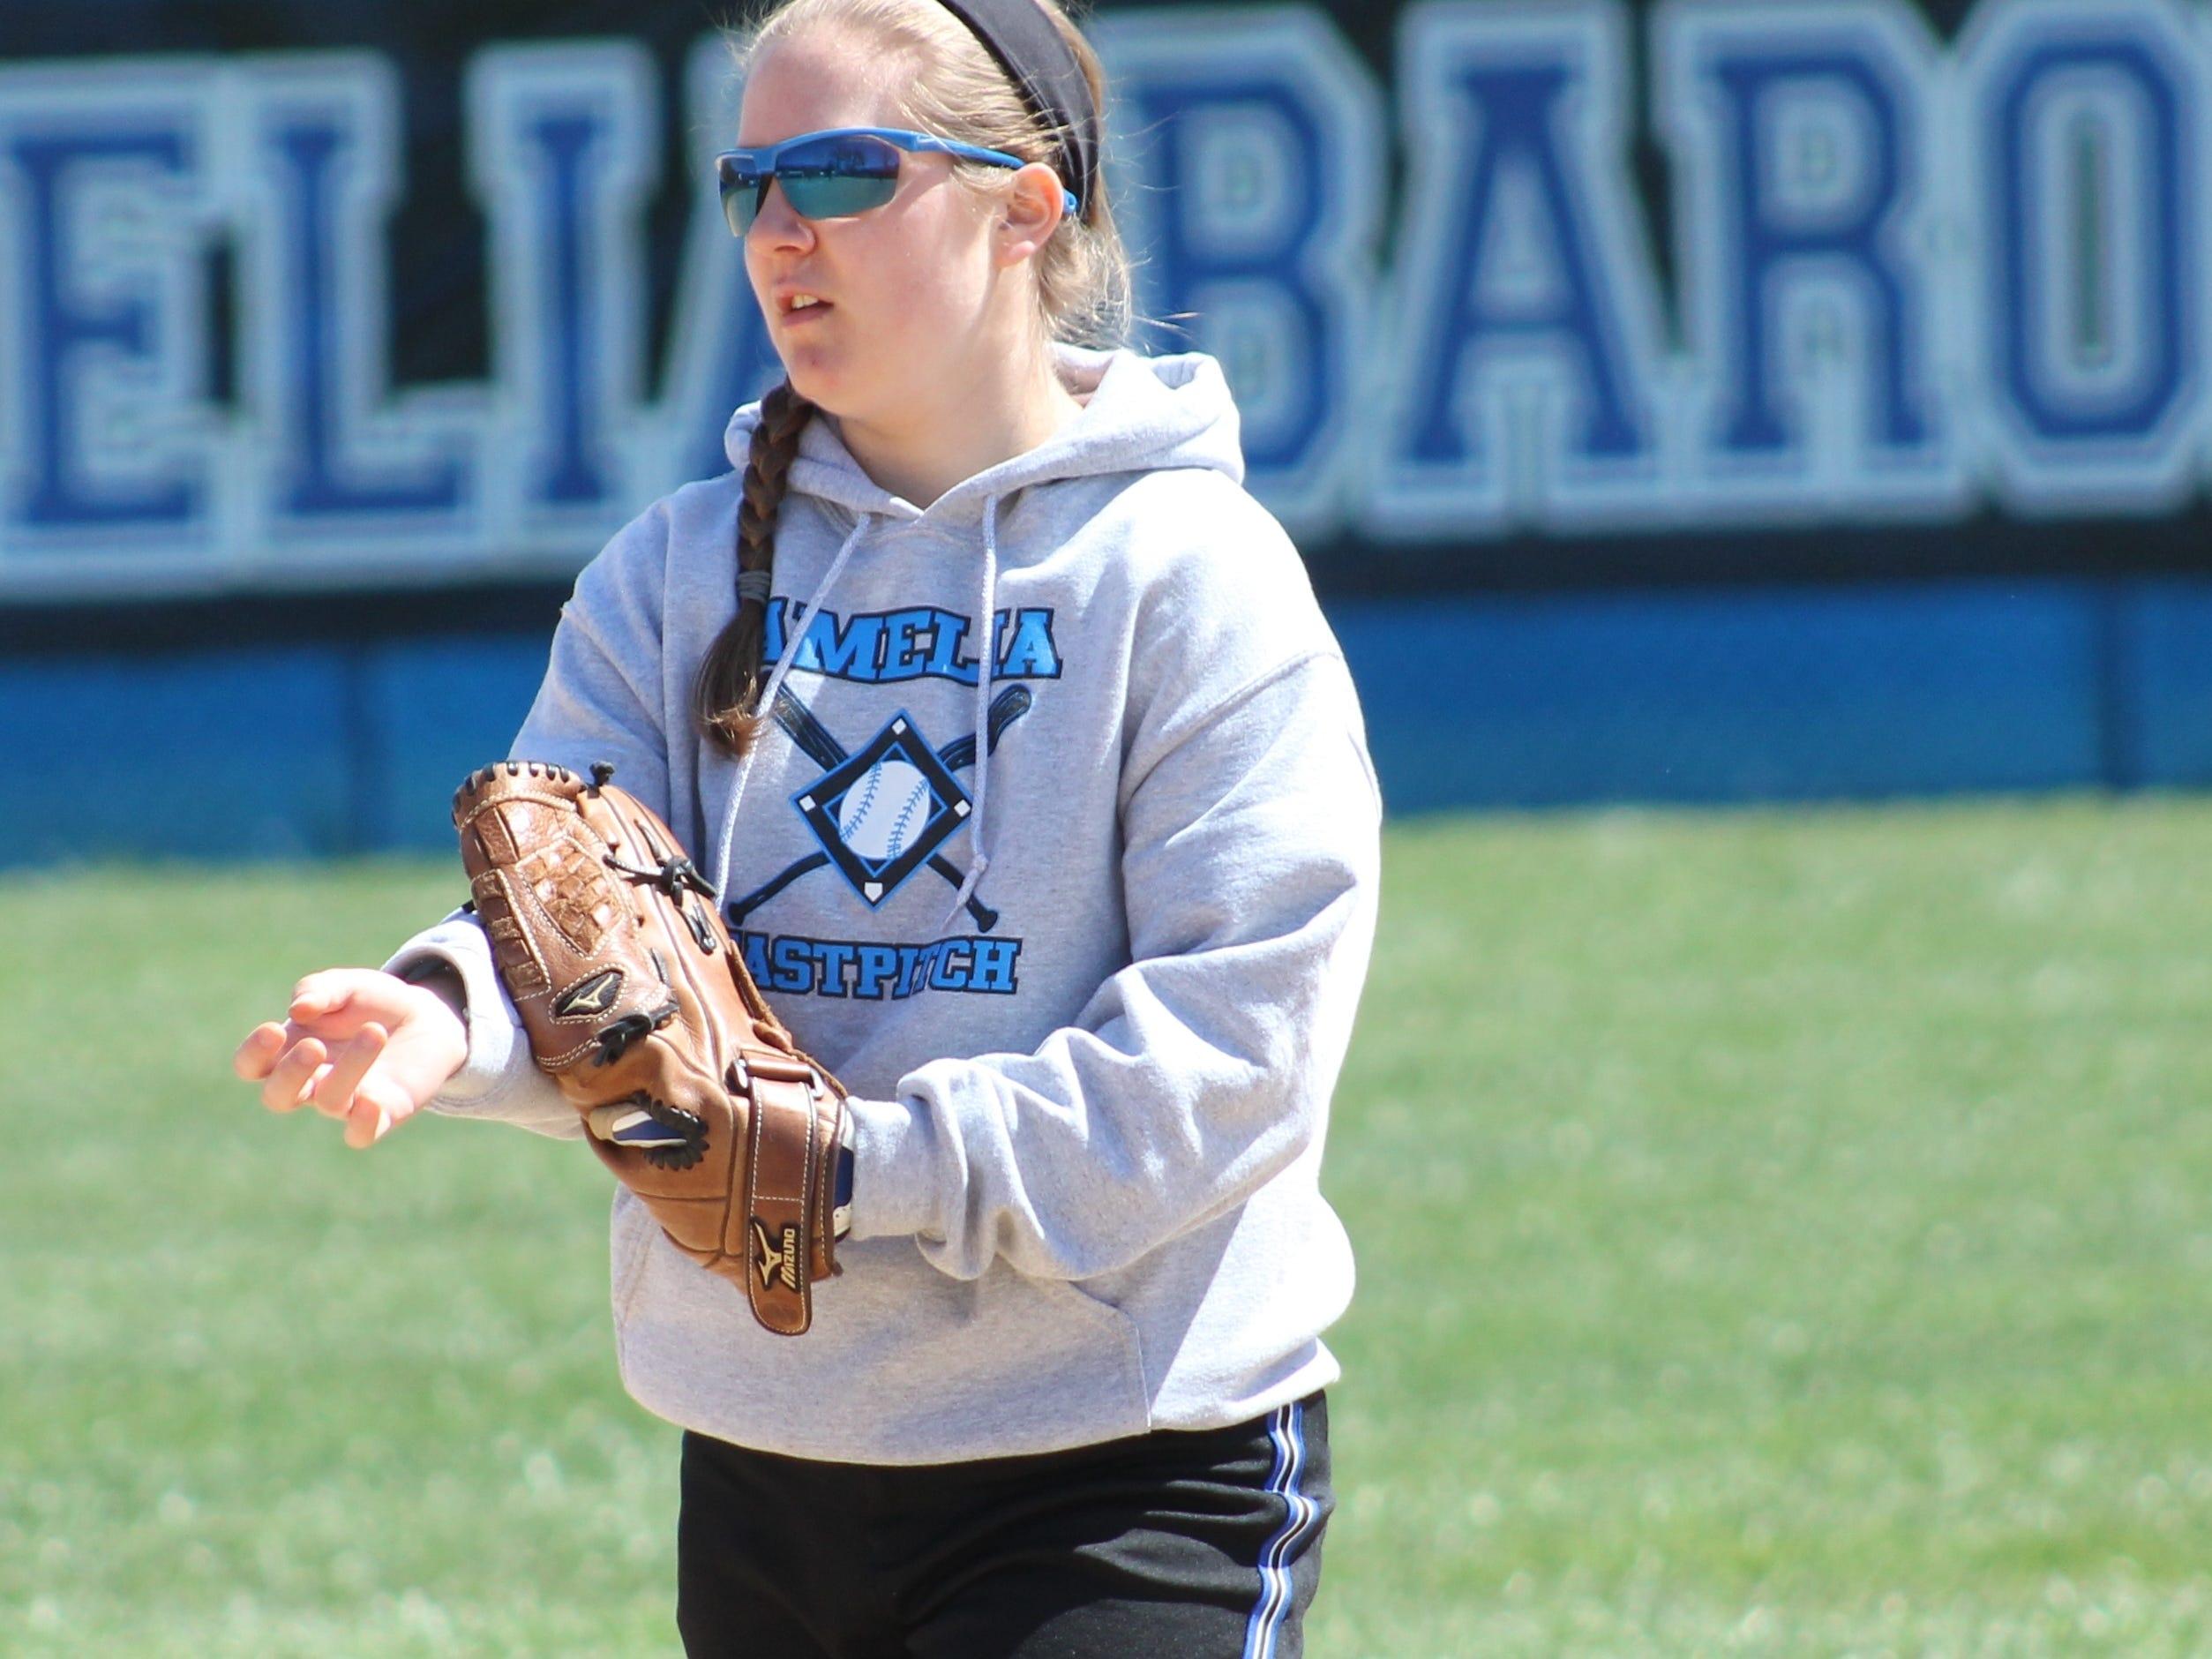 Second baseman Elena McDonald is the lone senior on the Amelia softball team.